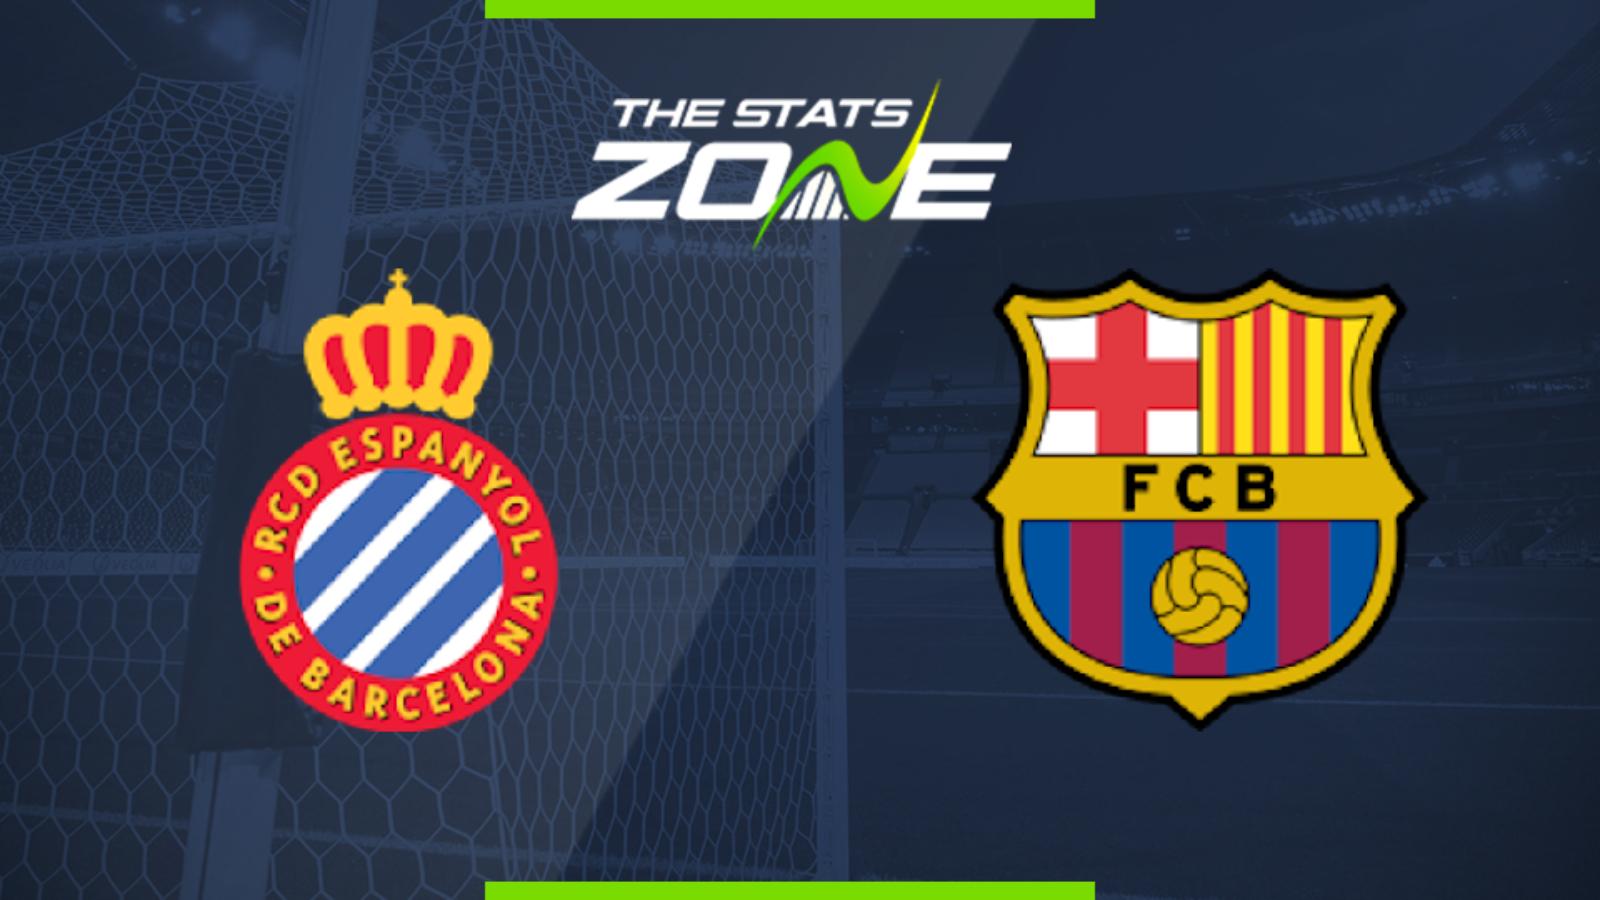 barcelona vs espanyol - photo #16